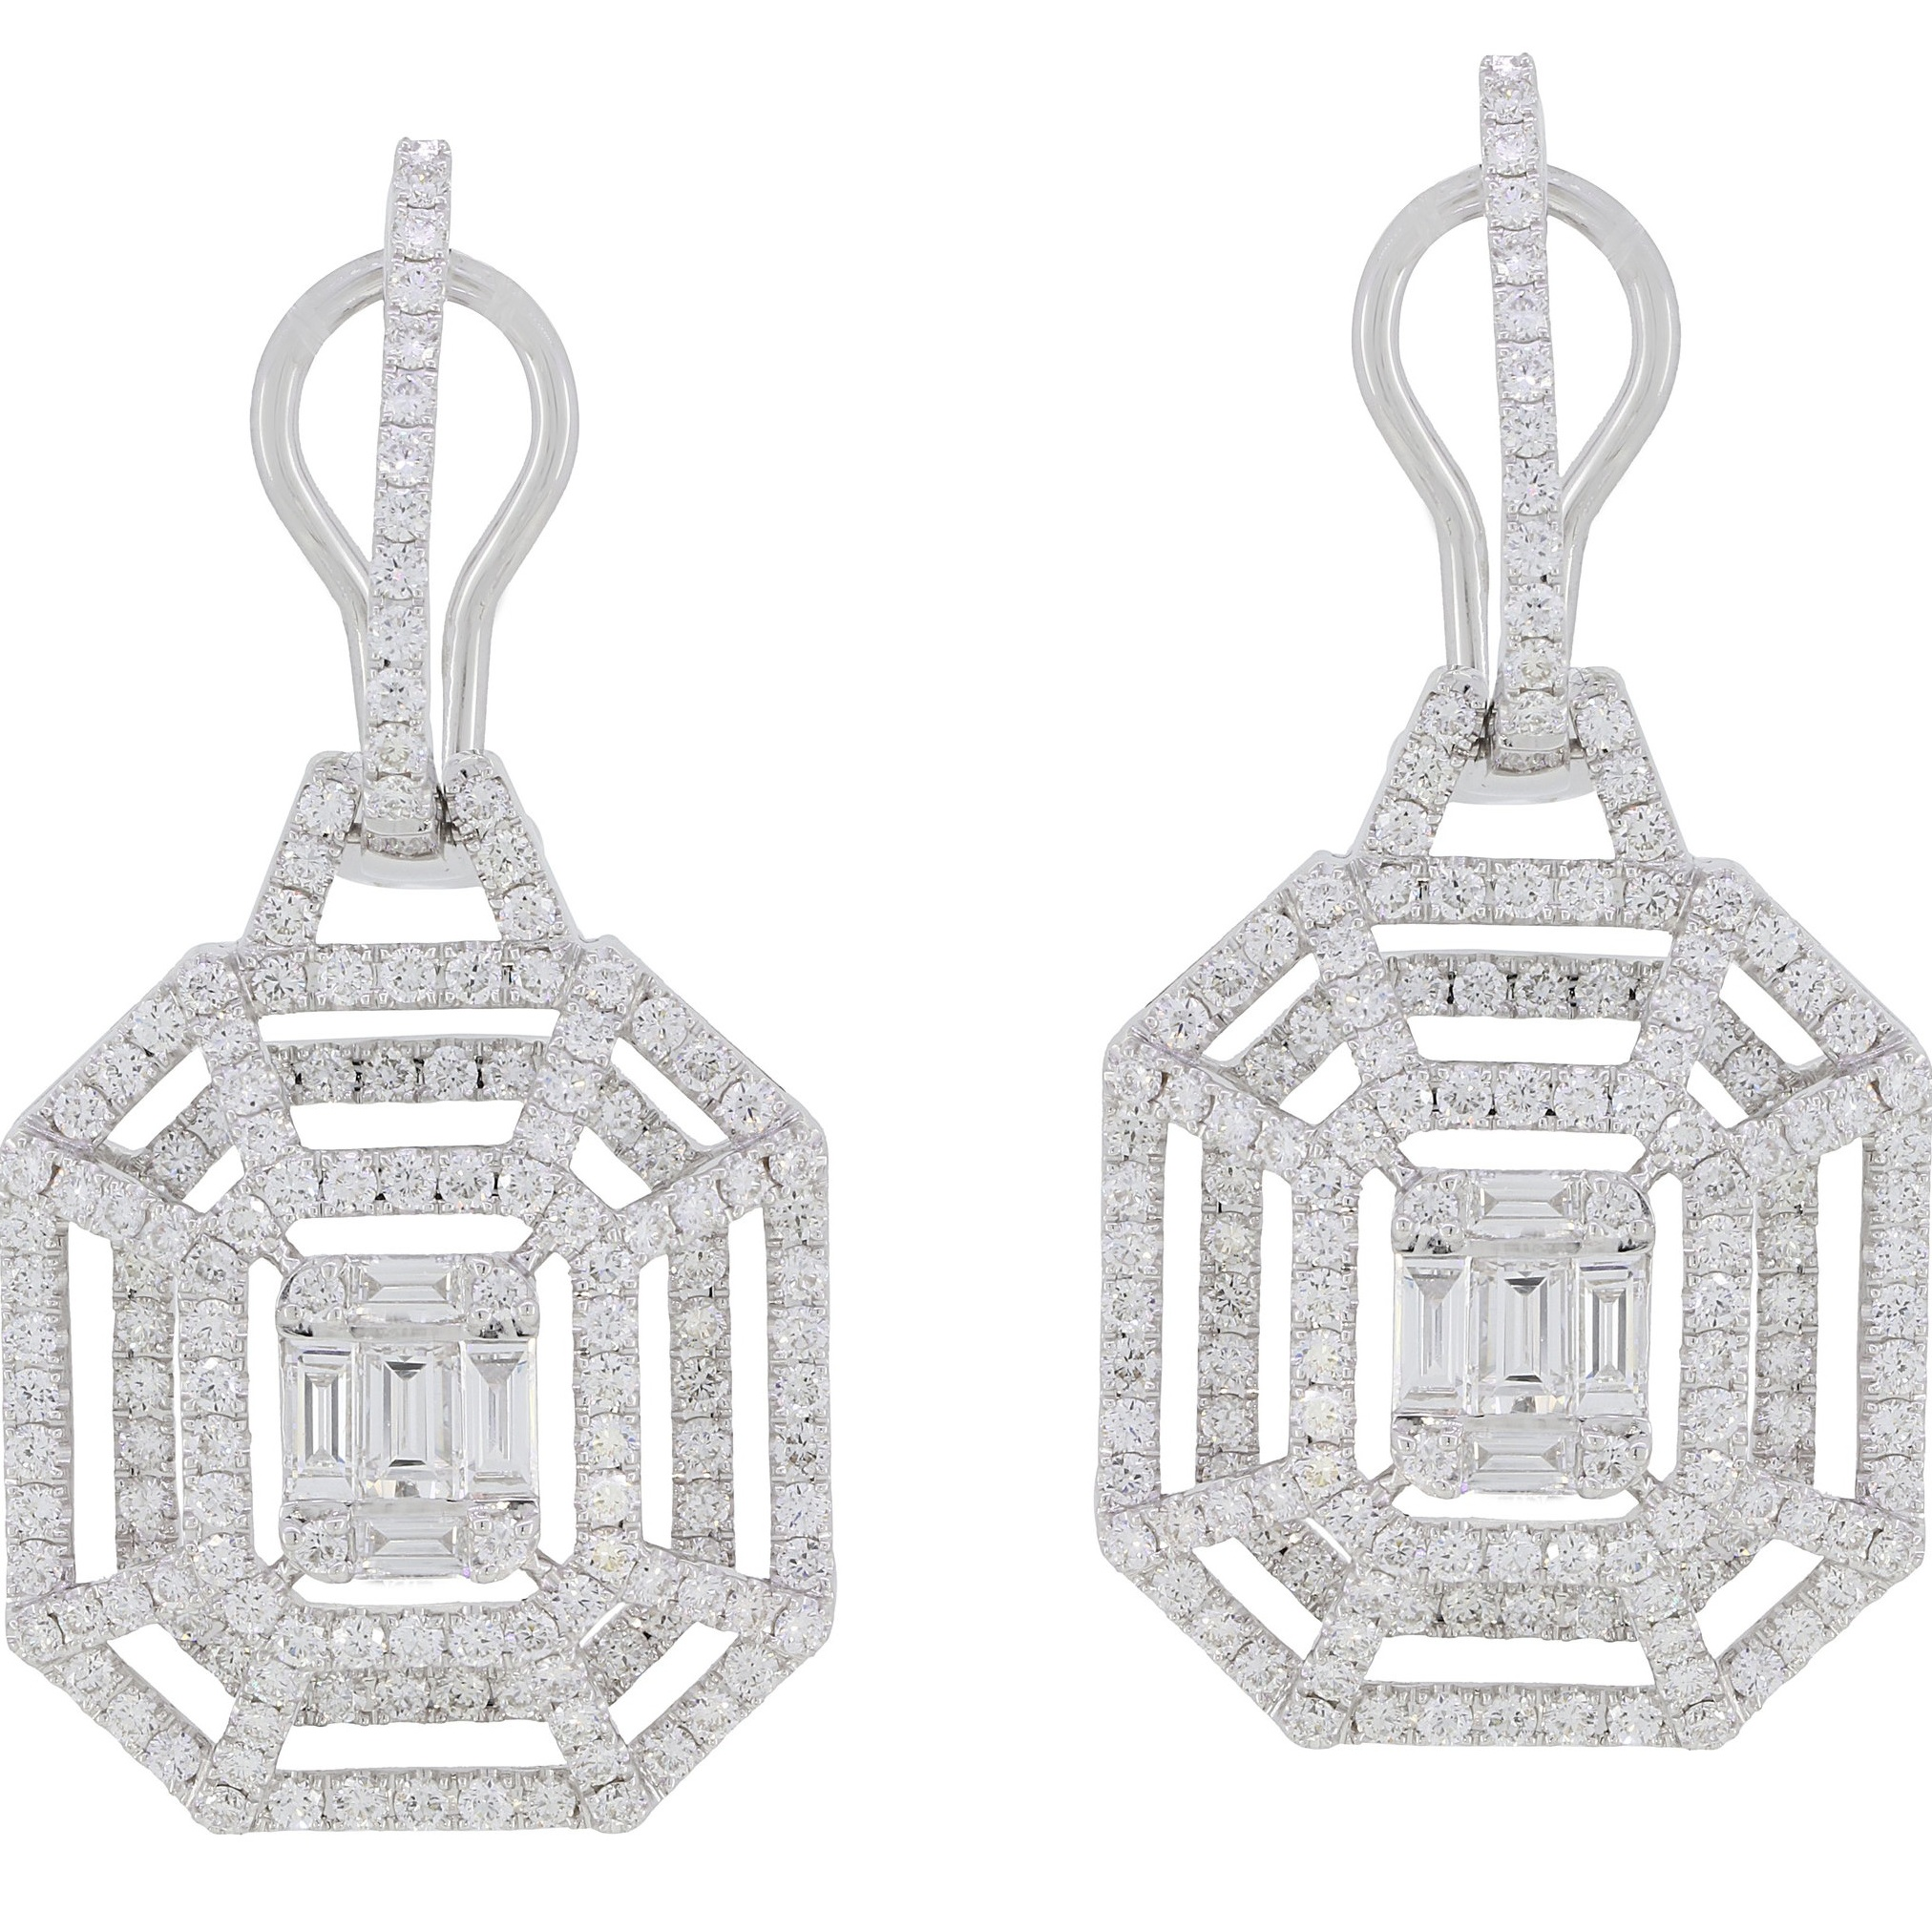 Stones:   -Diamond Round Full Cut  -Diamond Baguette